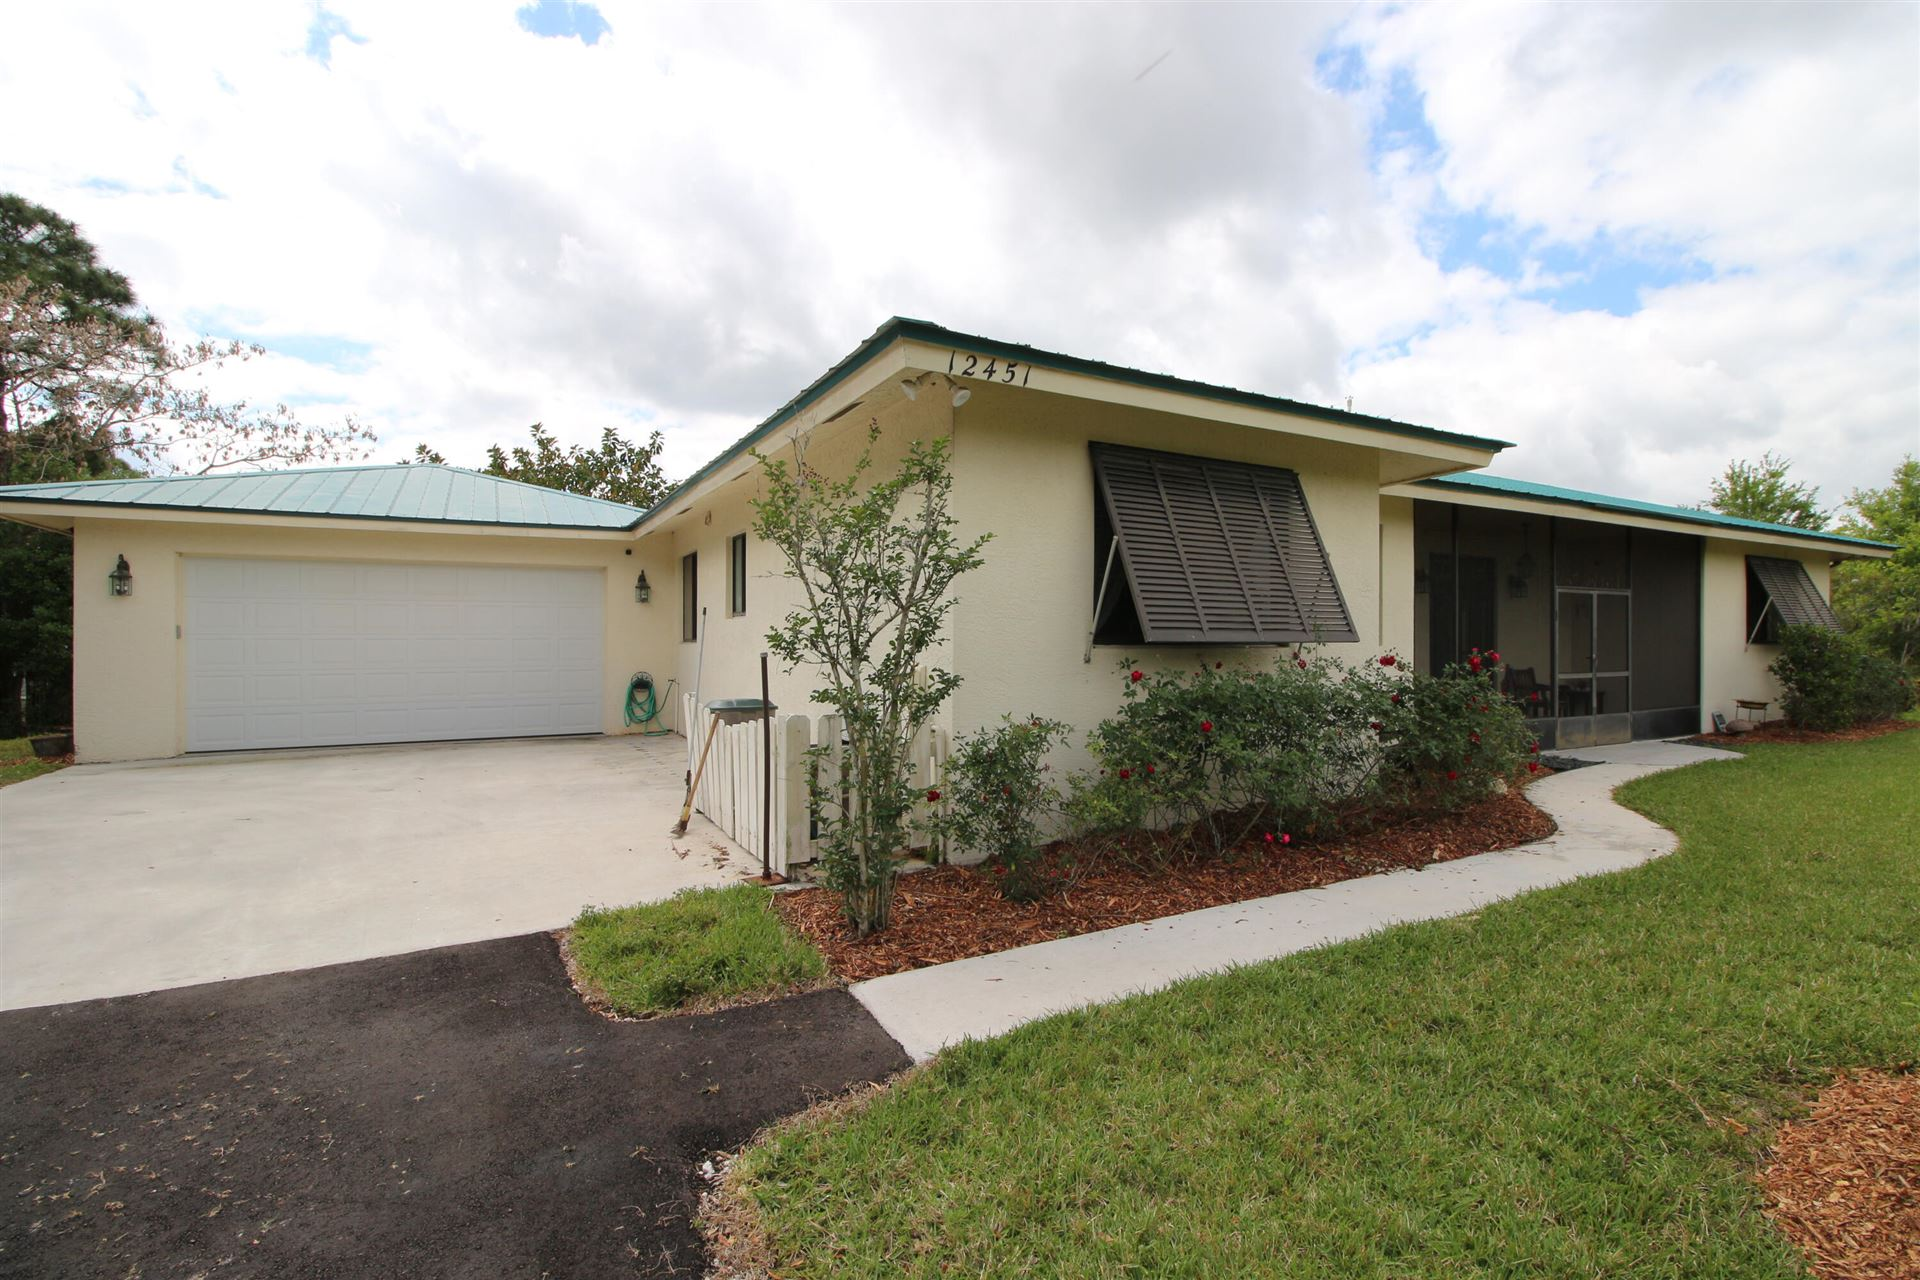 12451 Piper Cub Terrace, Port Saint Lucie, FL 34987 - #: RX-10702328